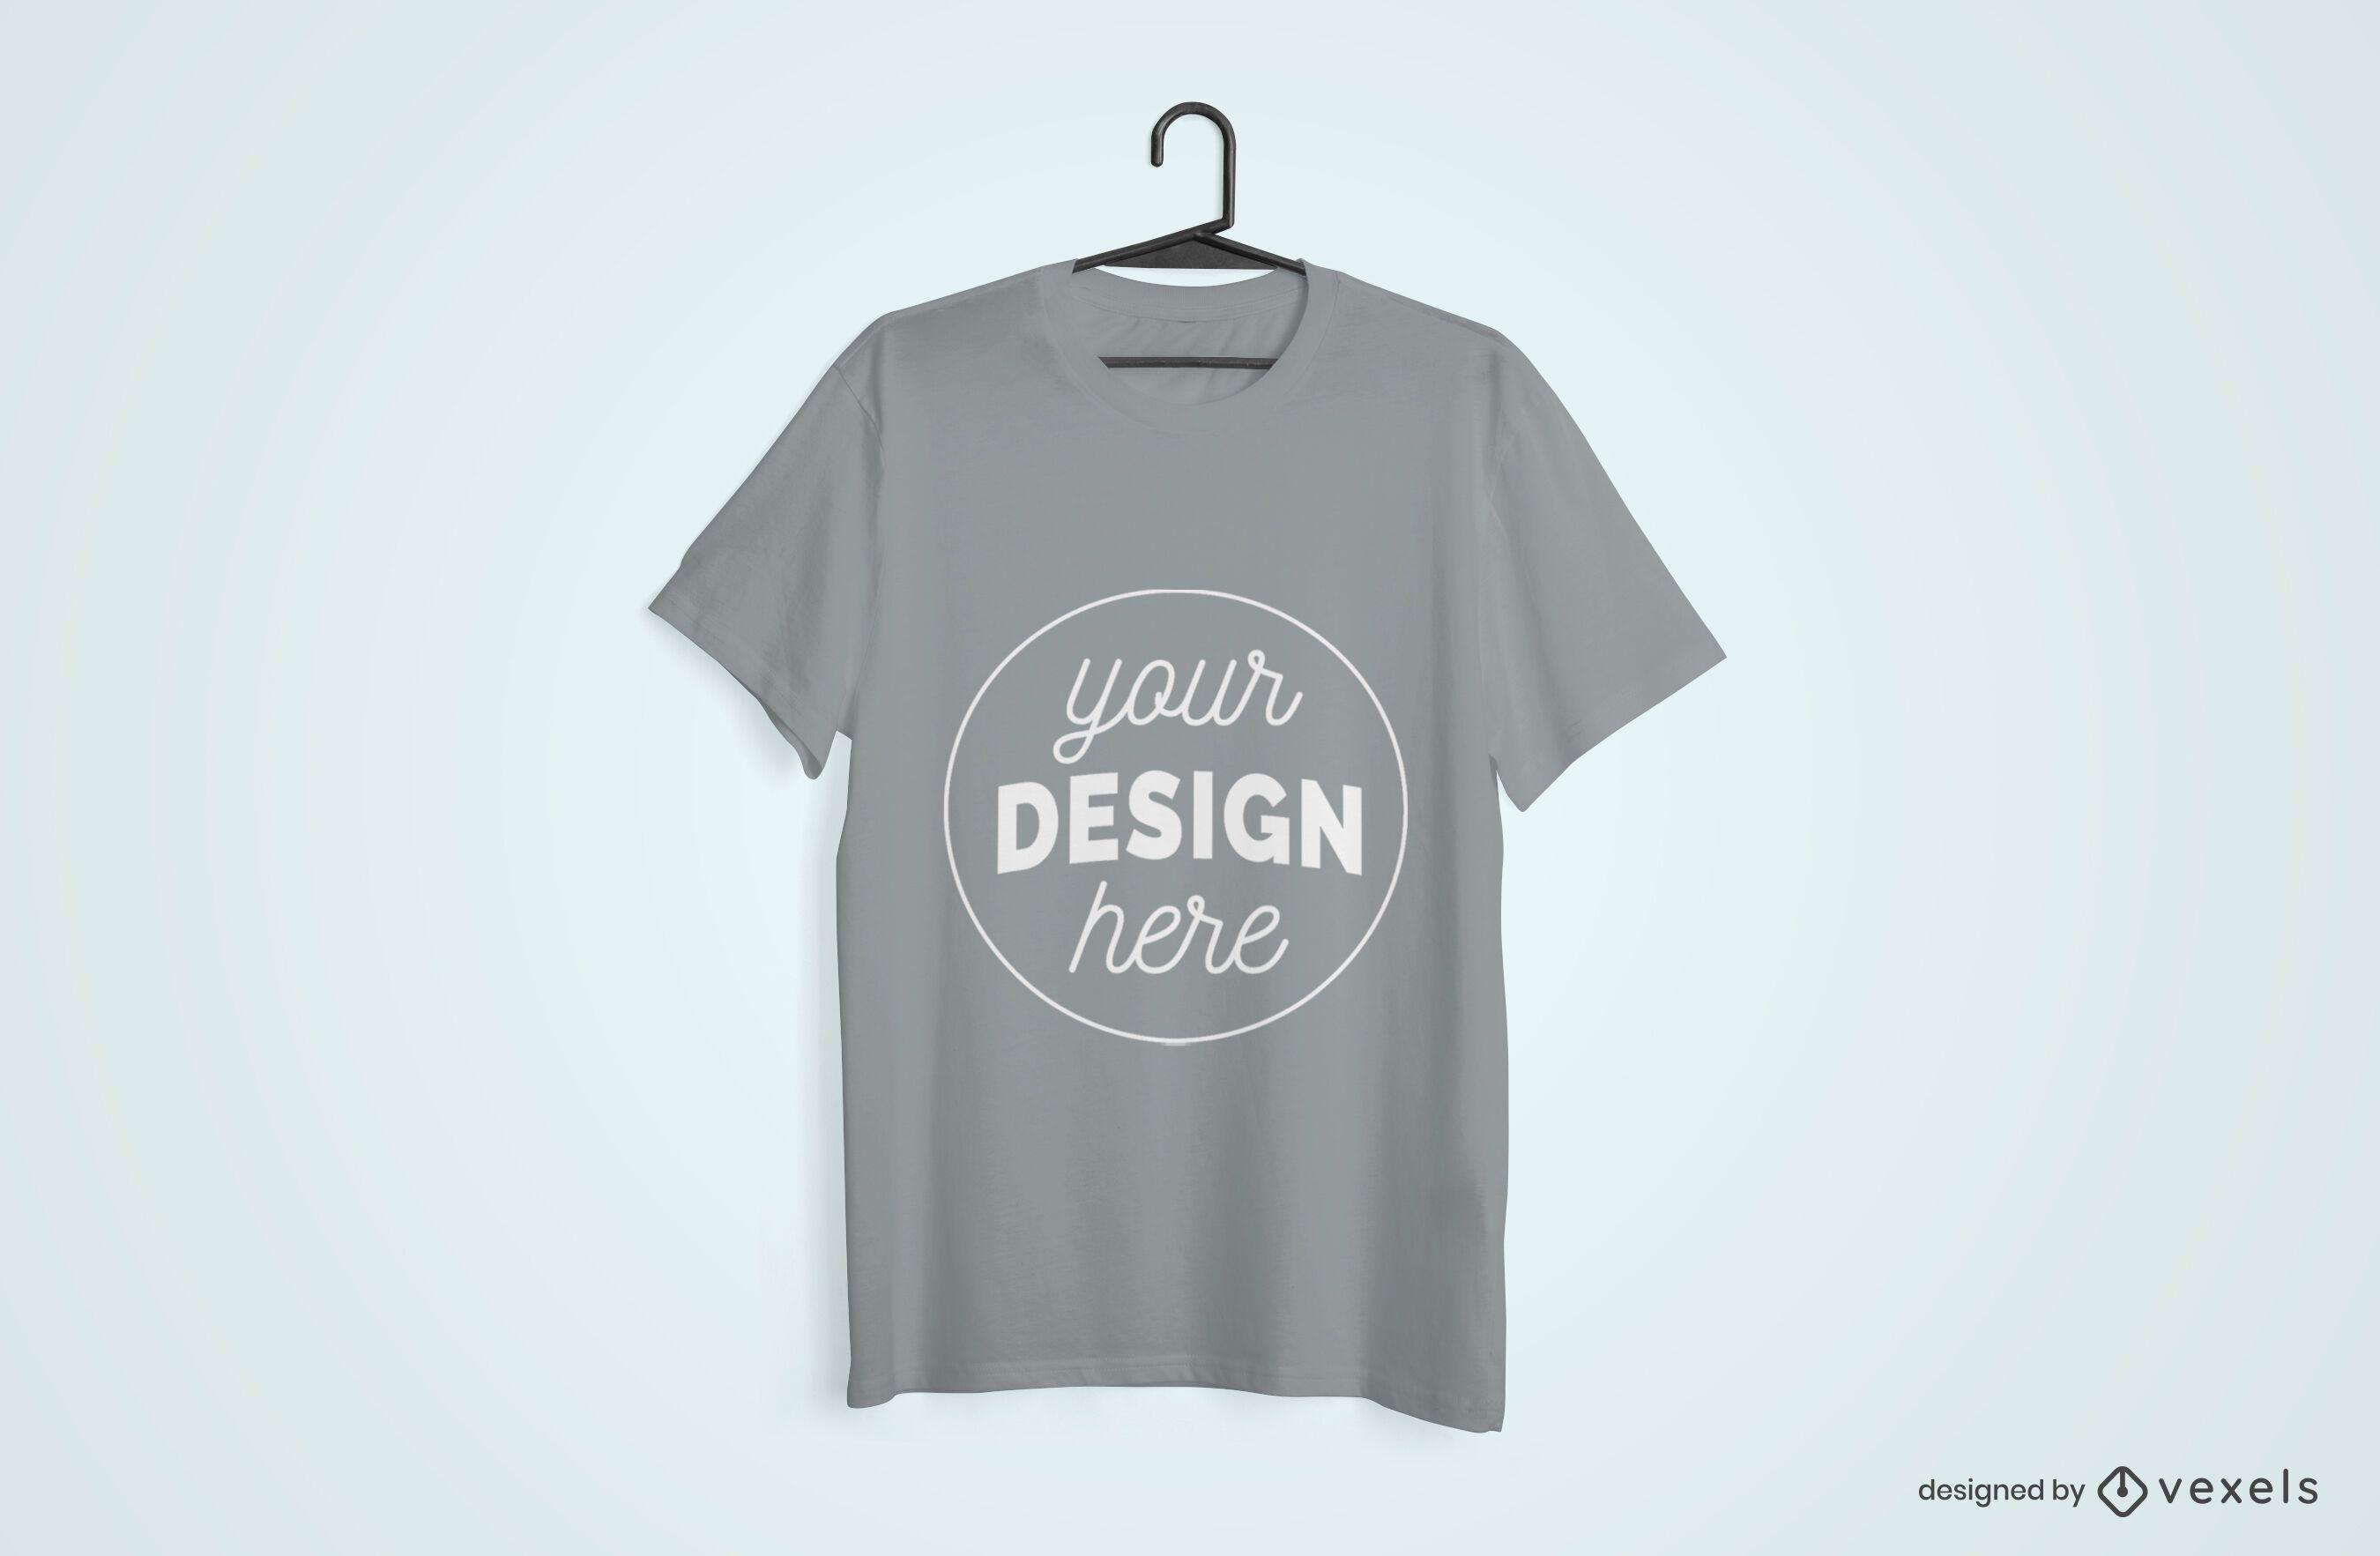 Diseño de maqueta de camiseta colgada